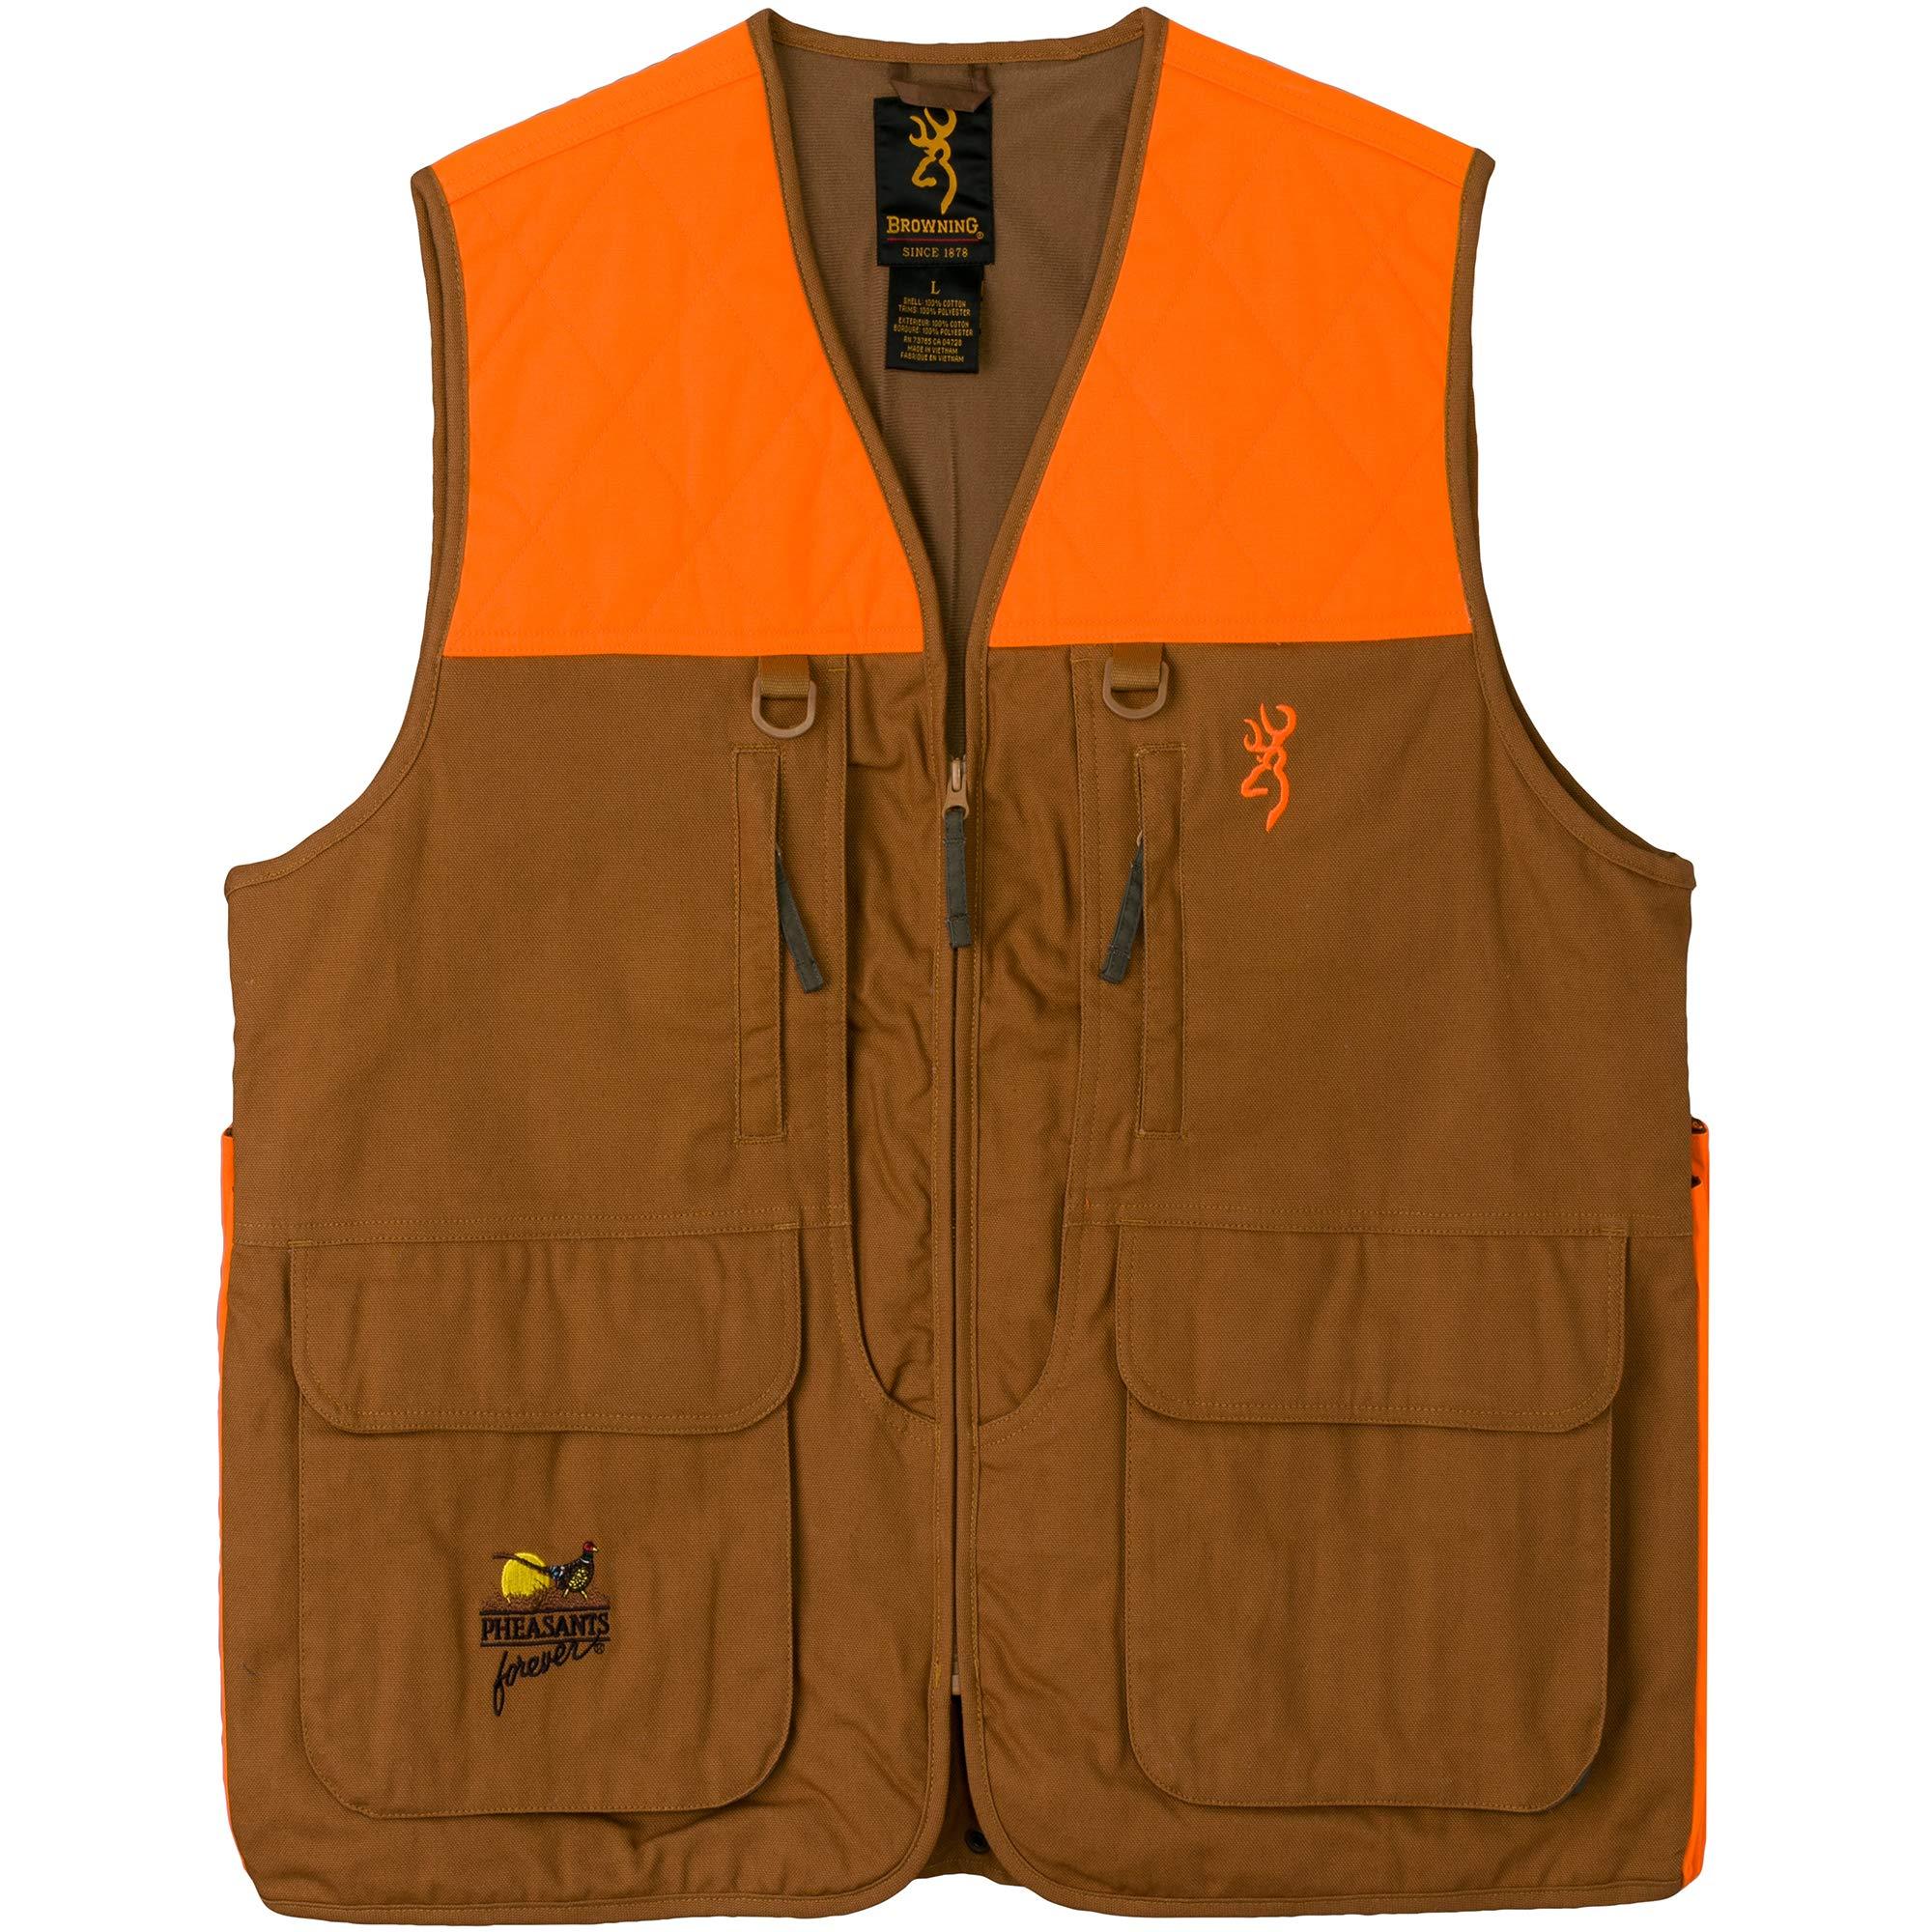 Browning Pheasants Forever Vest, Khaki/Blaze, Medium-Regular by Browning